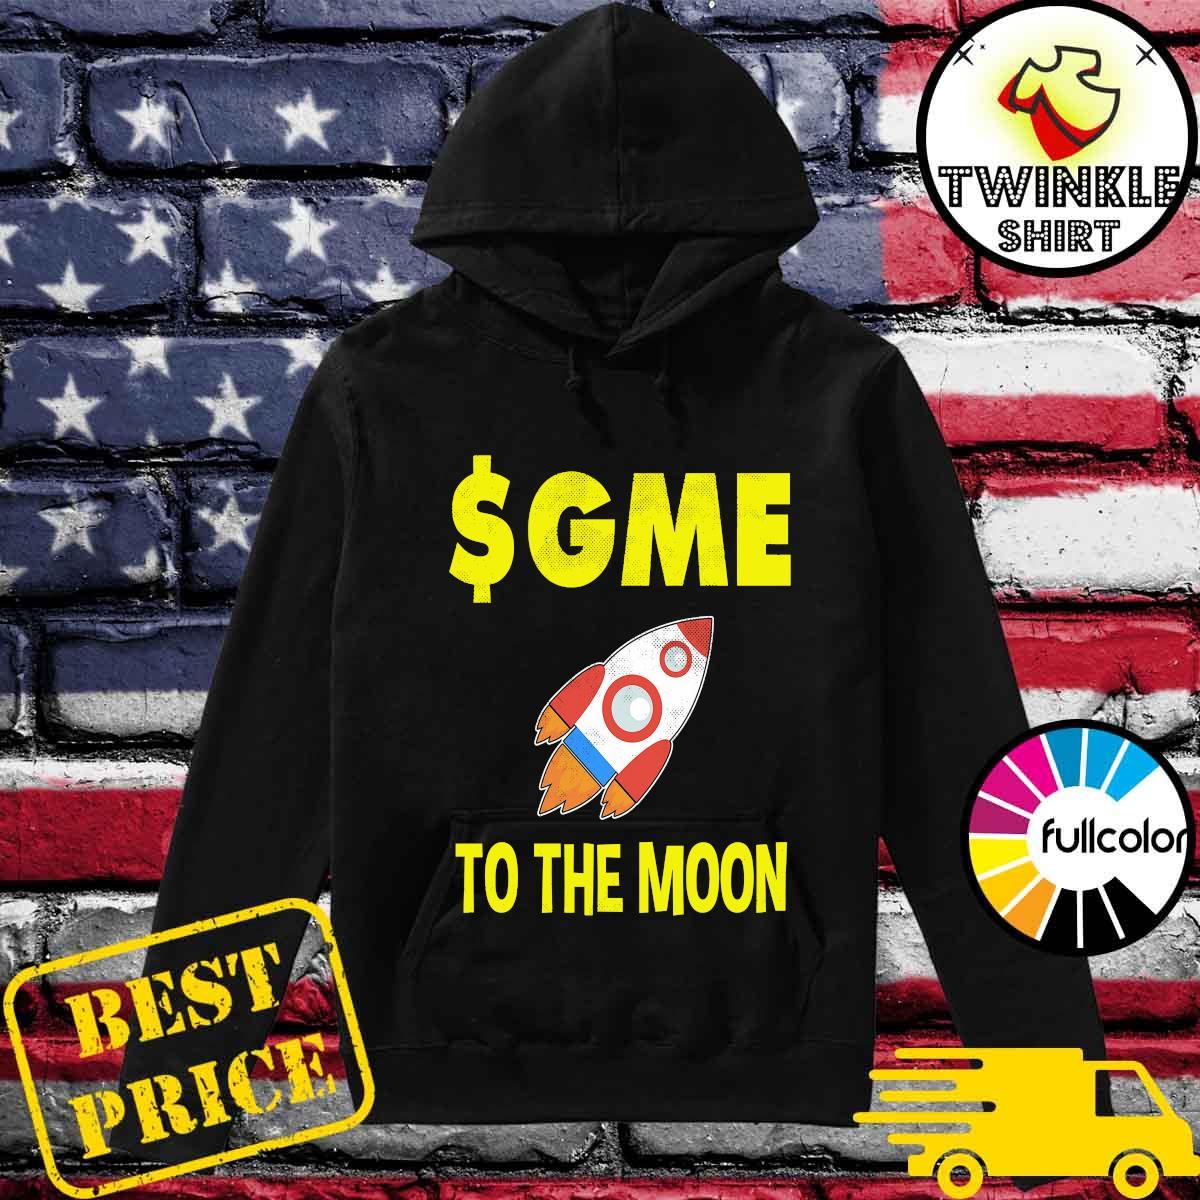 $GME To The Moon Ff GameStonk Shirt Hoodie